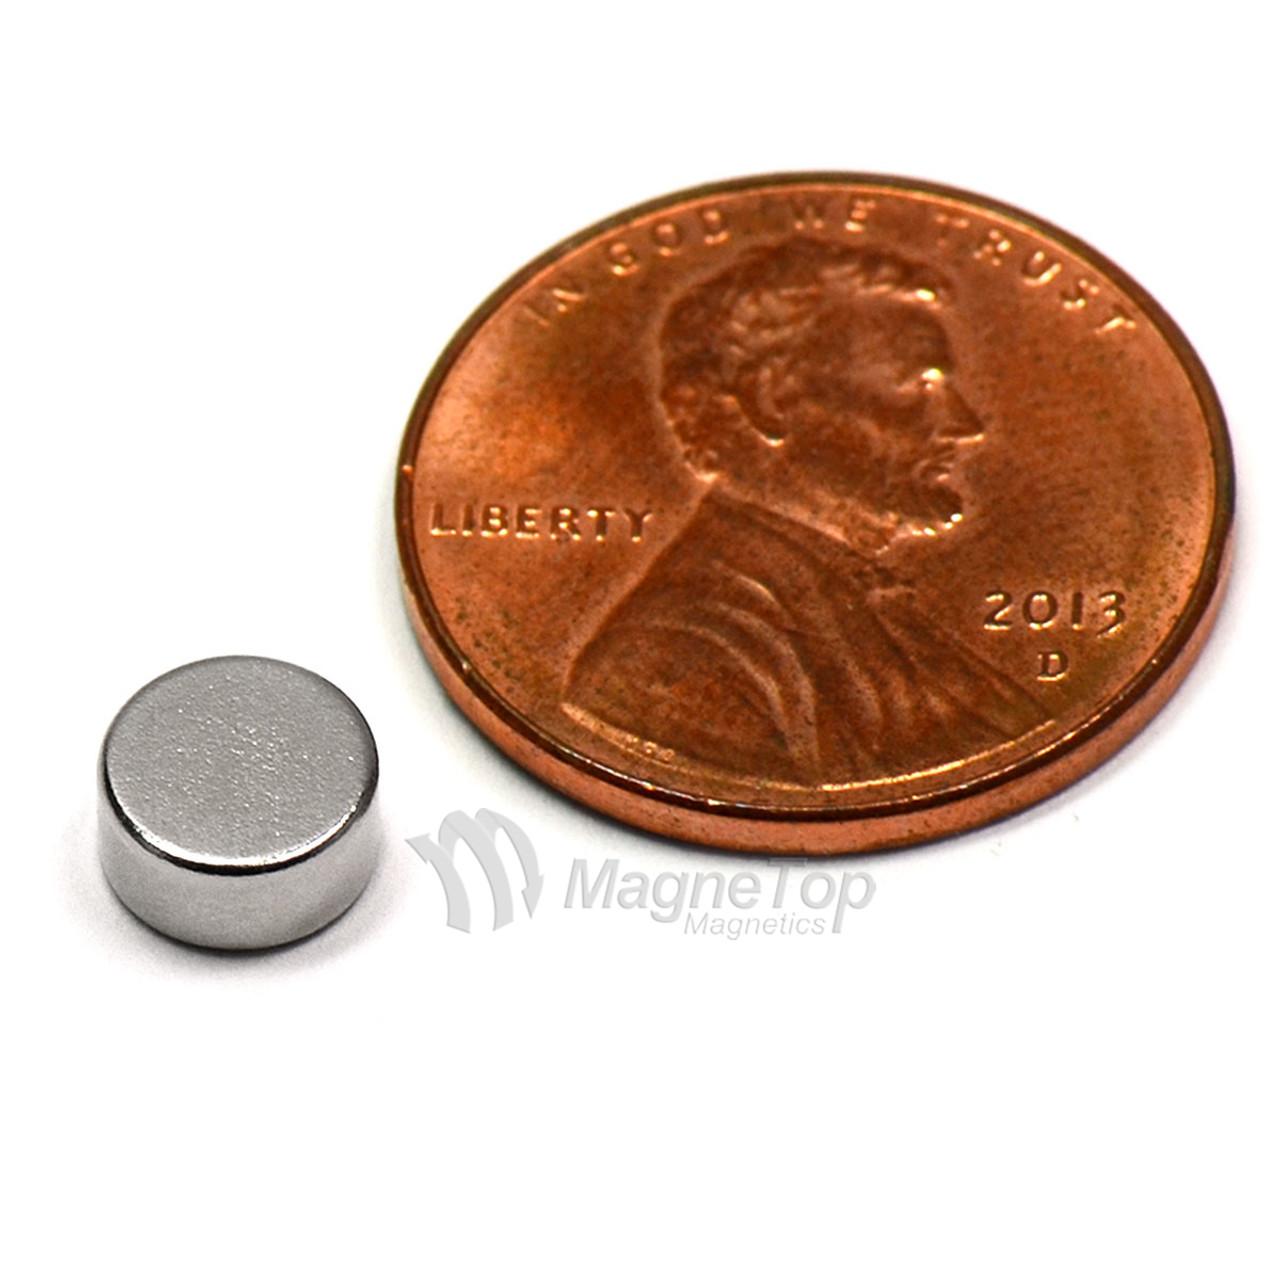 Neodymium Disk  -  6mm x 3mm - N45